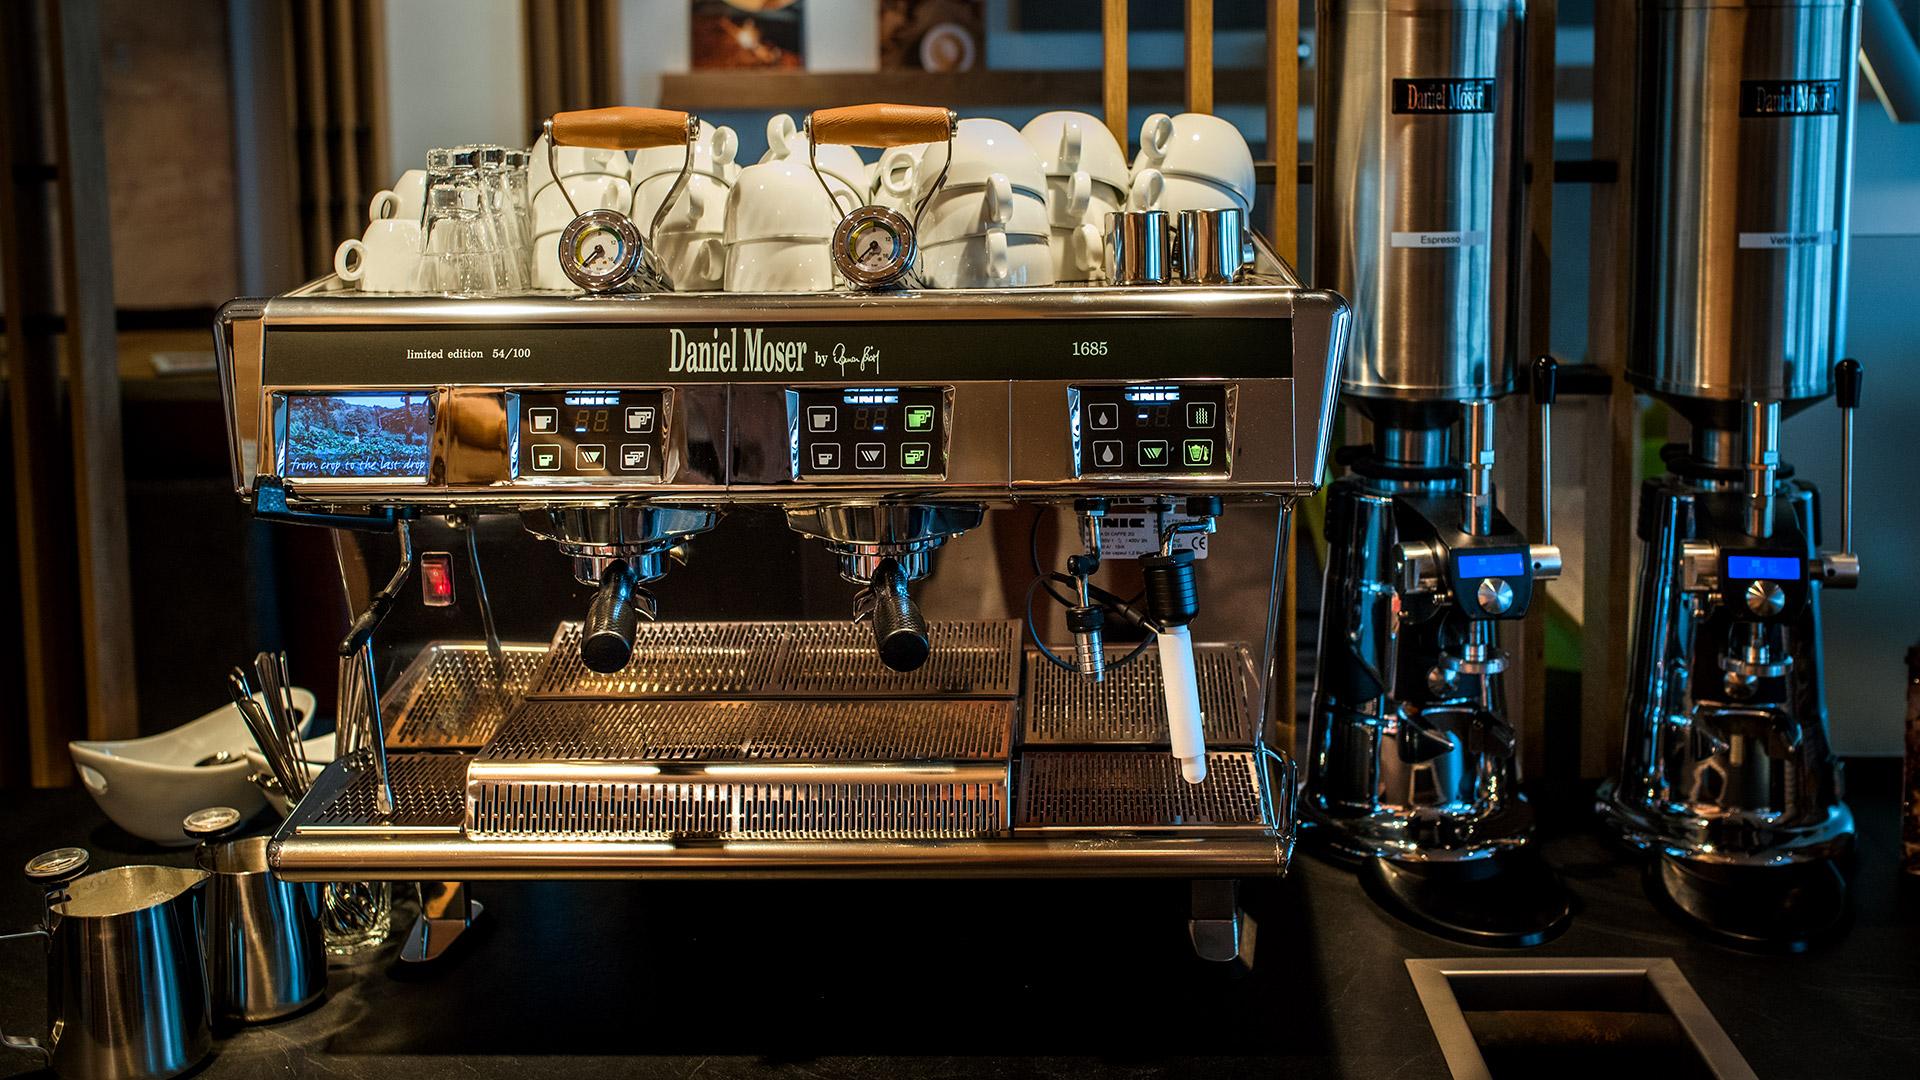 KaffeeErleben